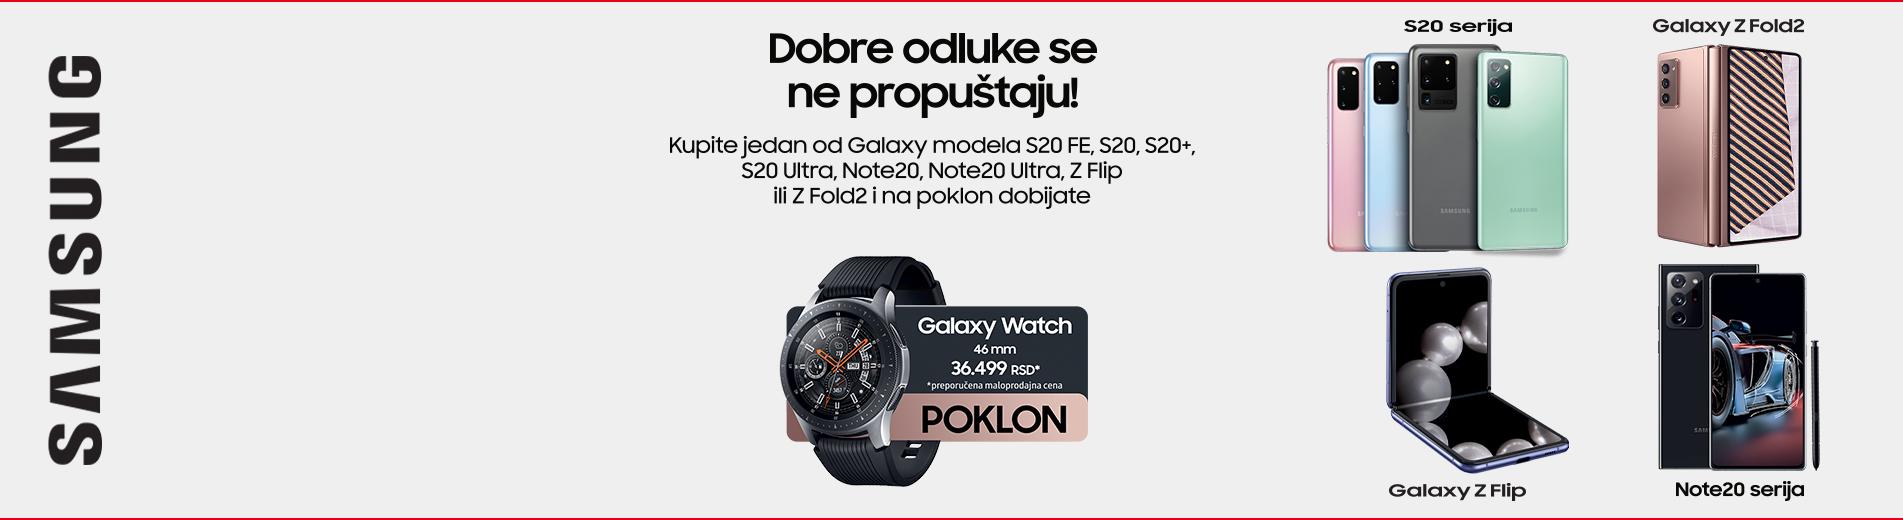 Samsung telefon i poklon sat